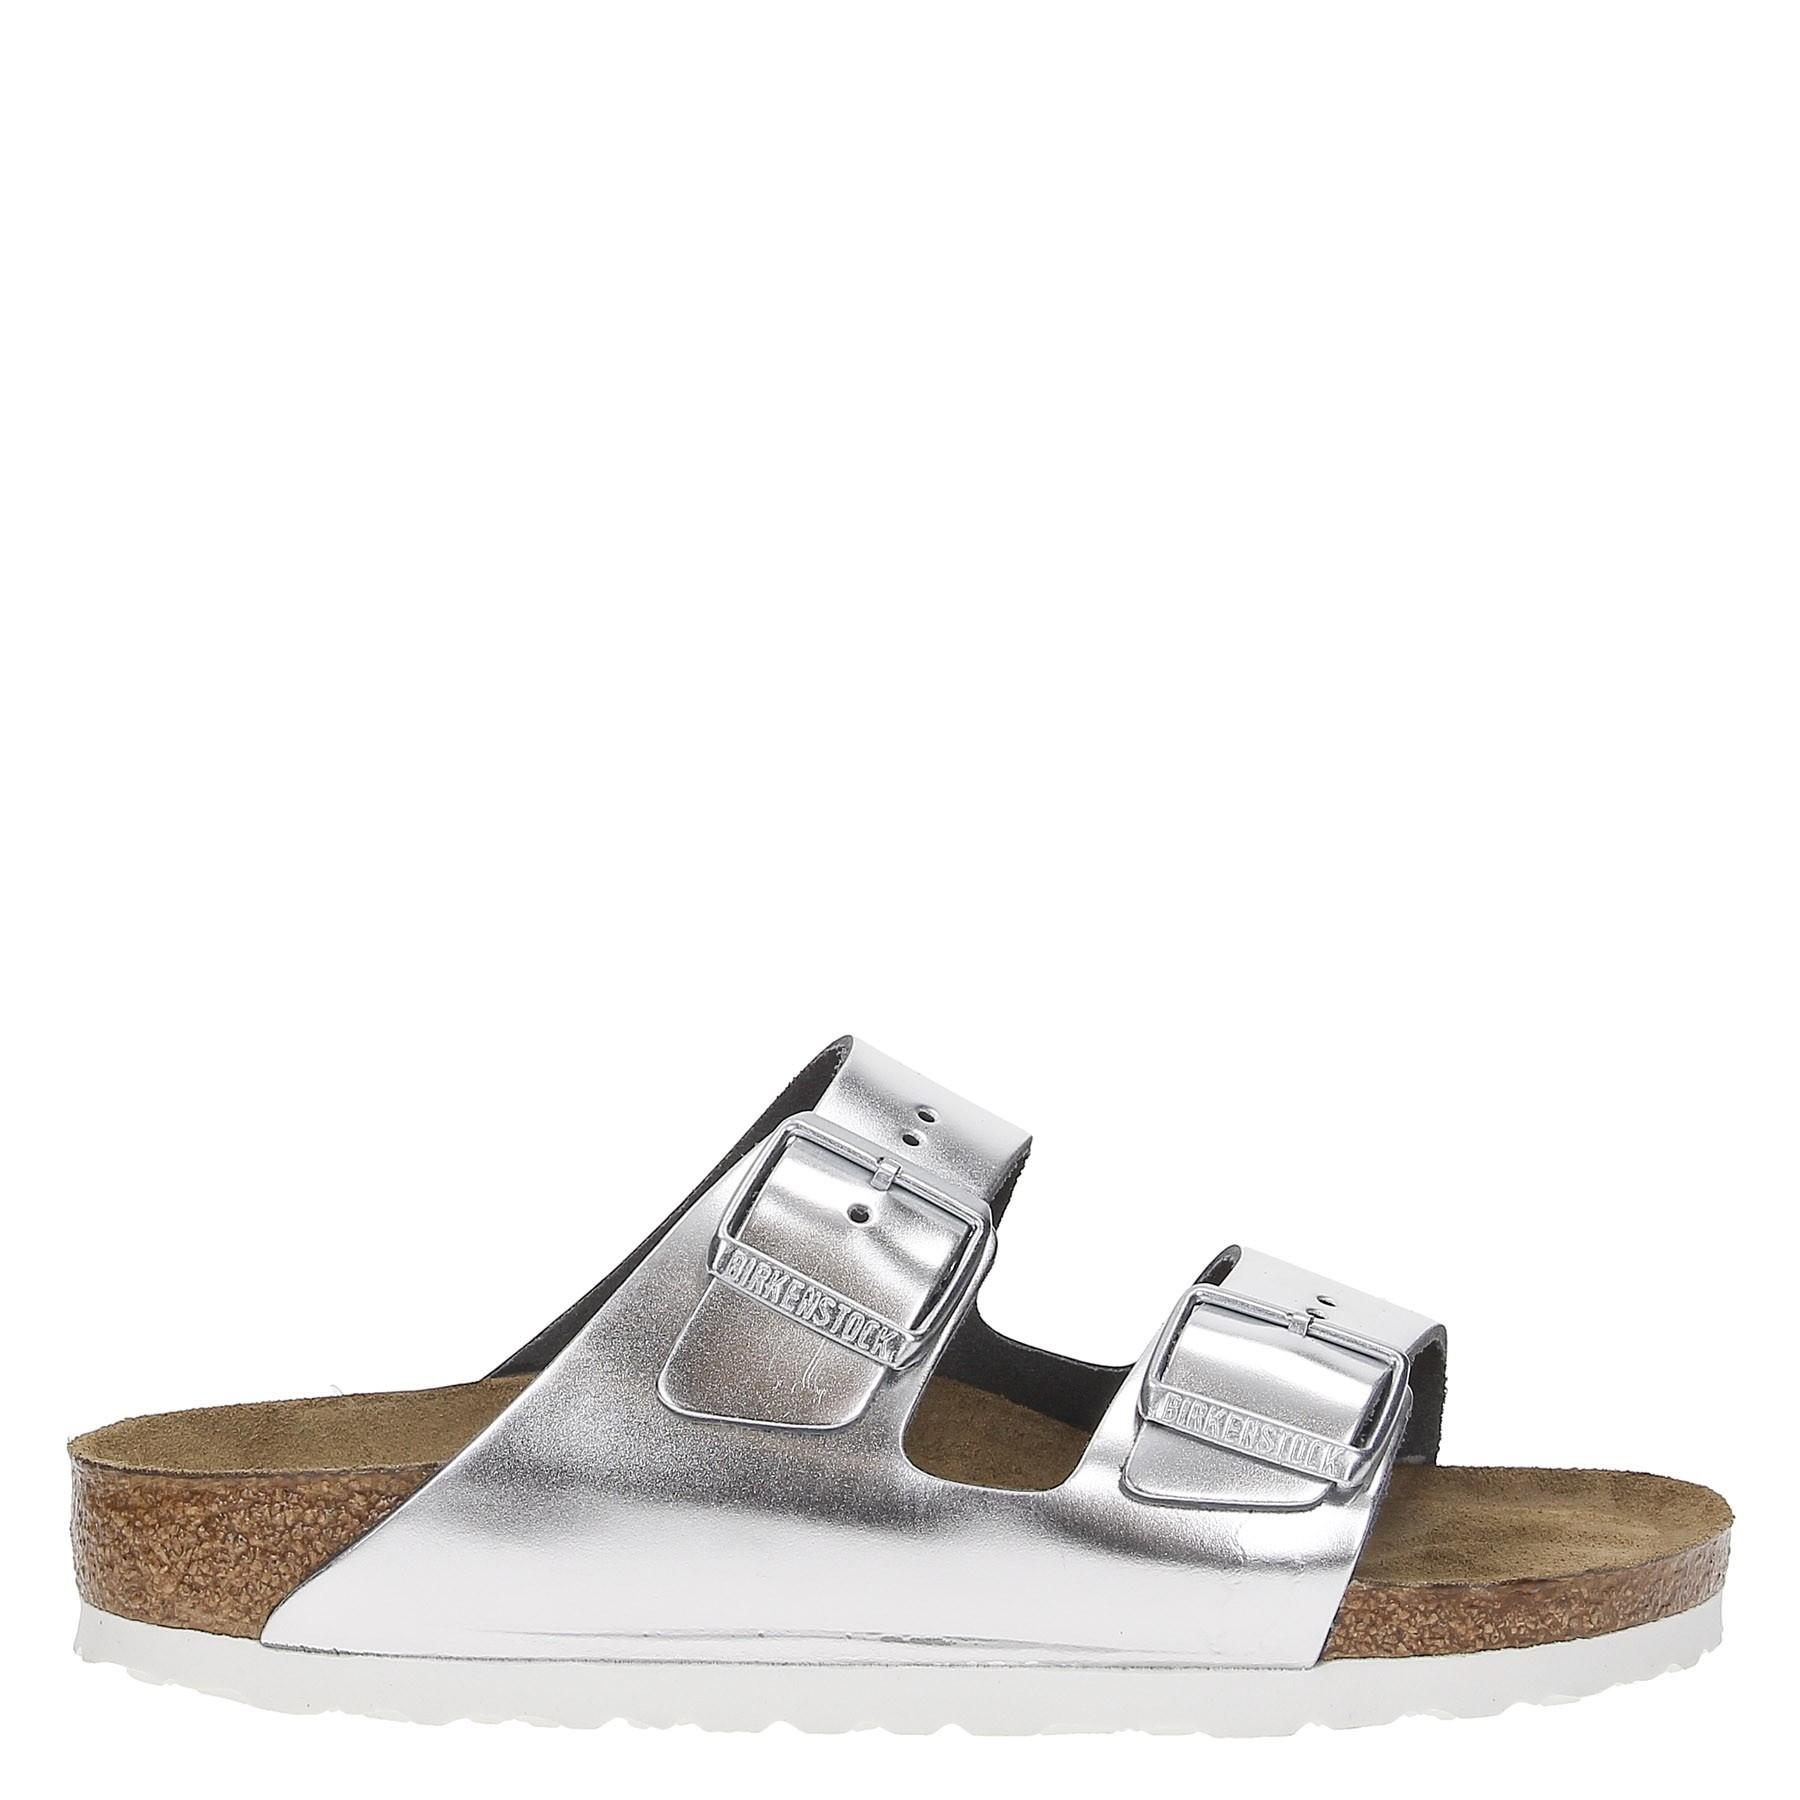 WRg5jiGZc5 Sandalo Donna Arizona Metal Argento